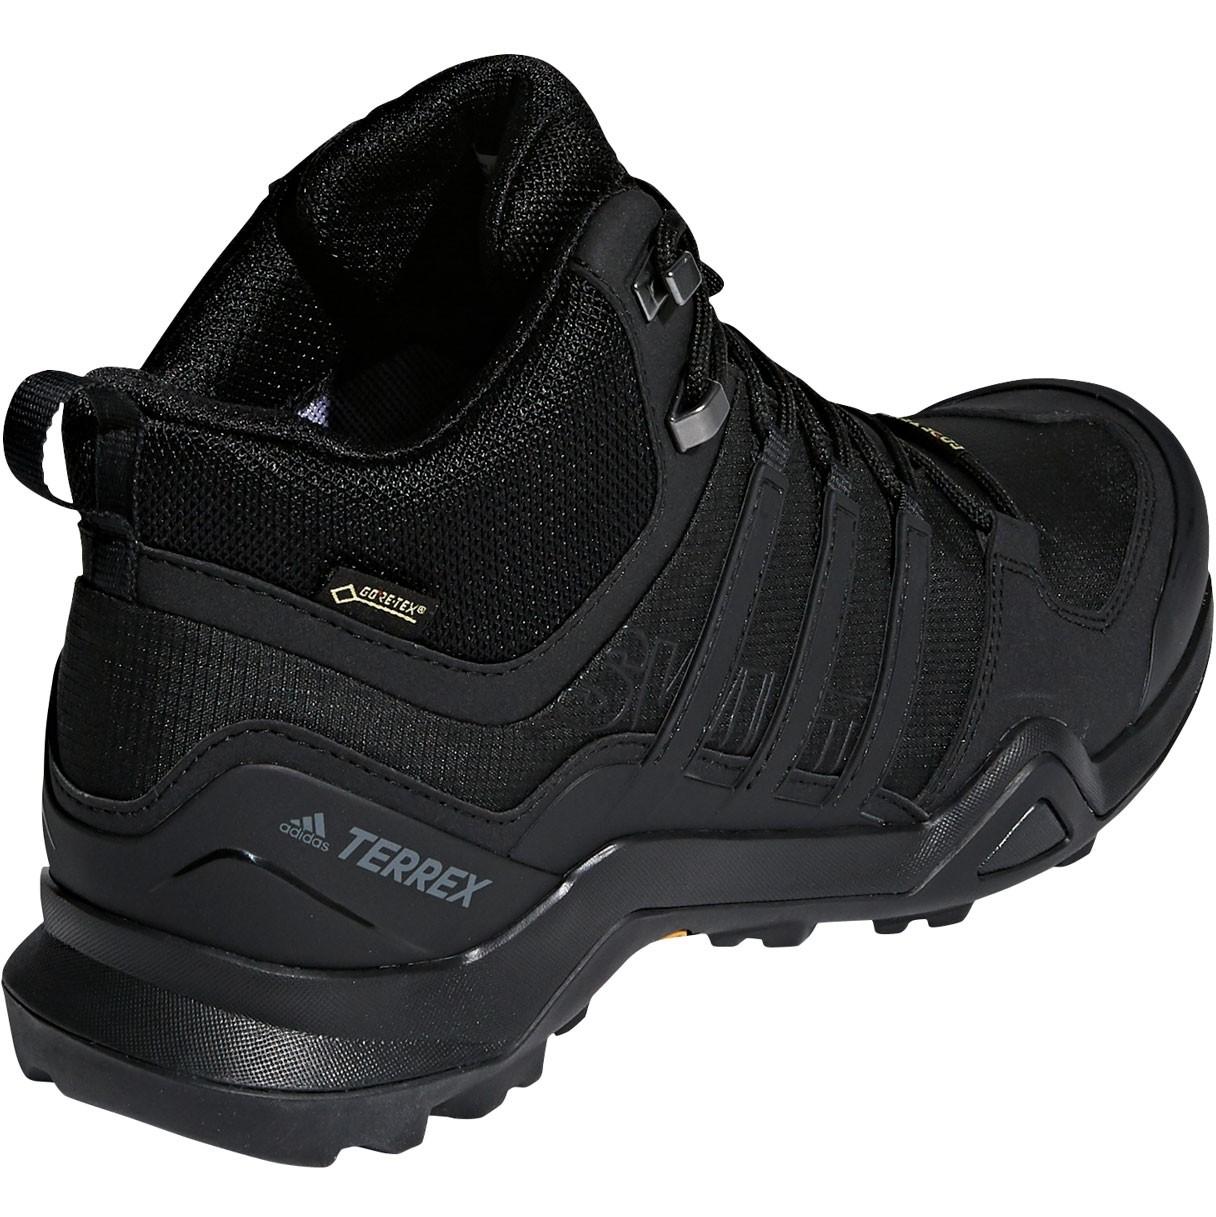 Adidas Terrex Swift R2 Mid GTX Men's Approach Shoe - Core Black